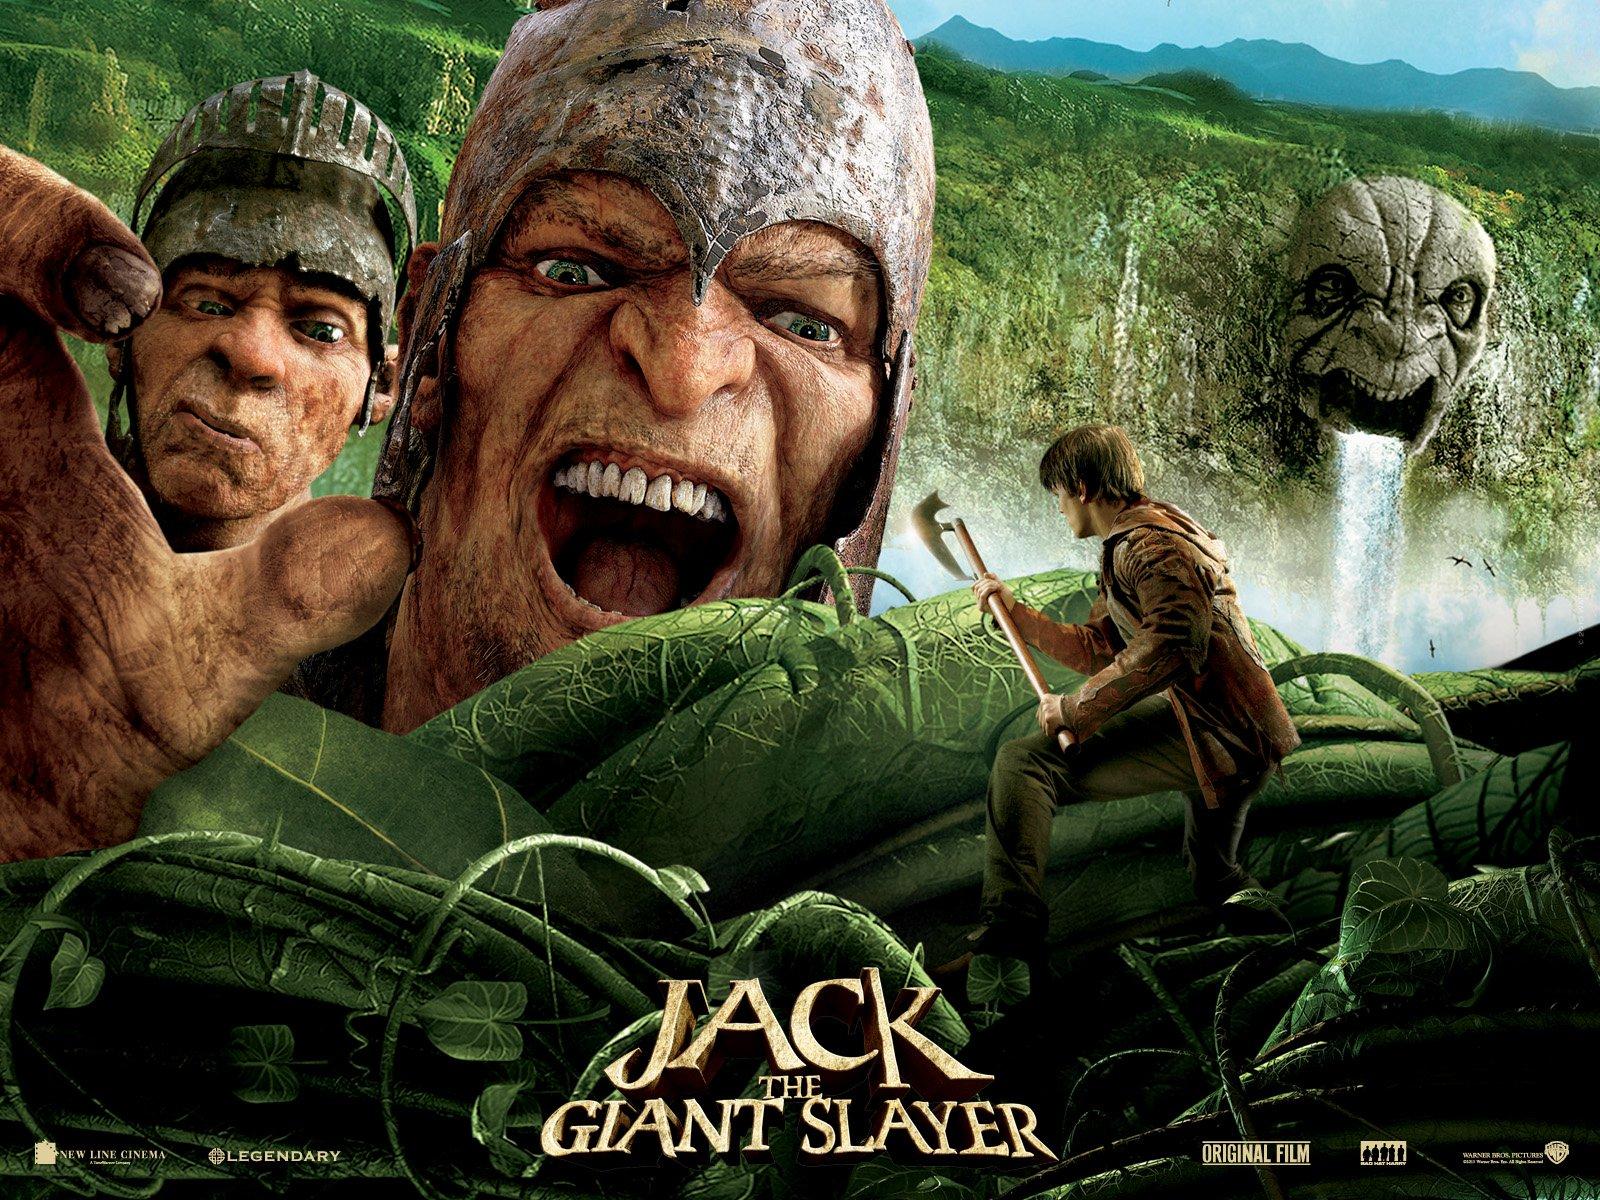 Jack and the giant bottom slayer